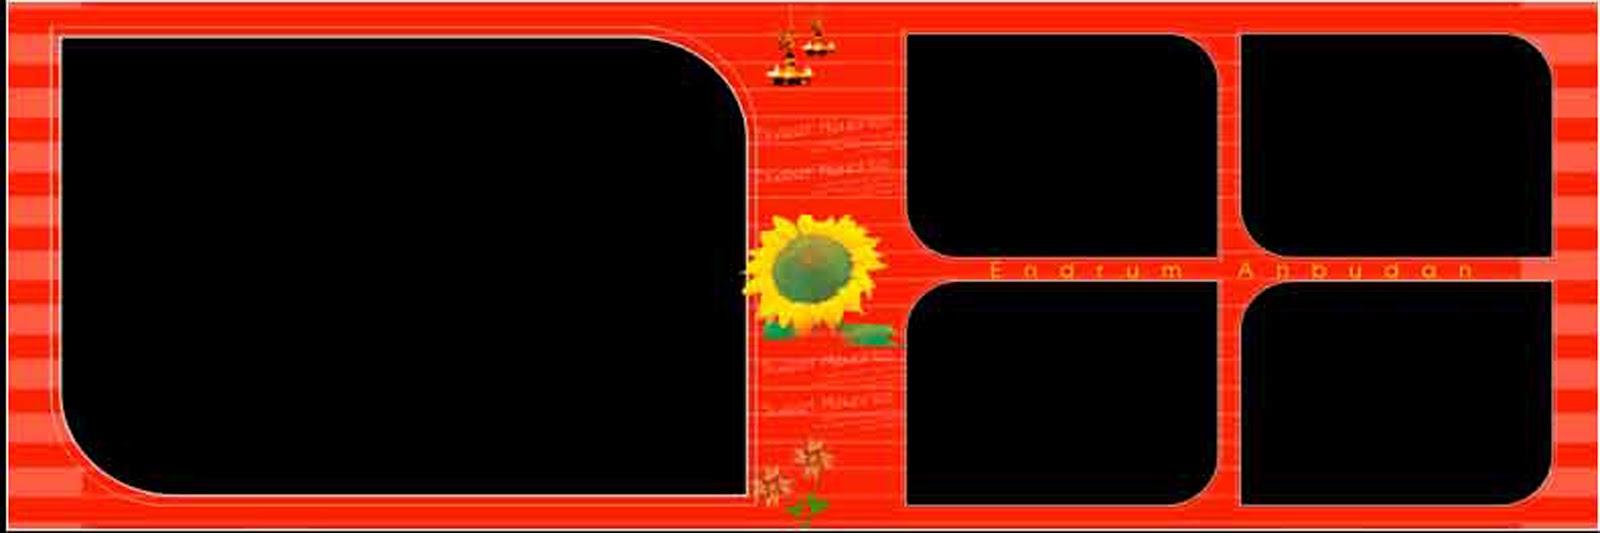 12x36 Psd Template Jpeg | Joy Studio Design Gallery - Best Design